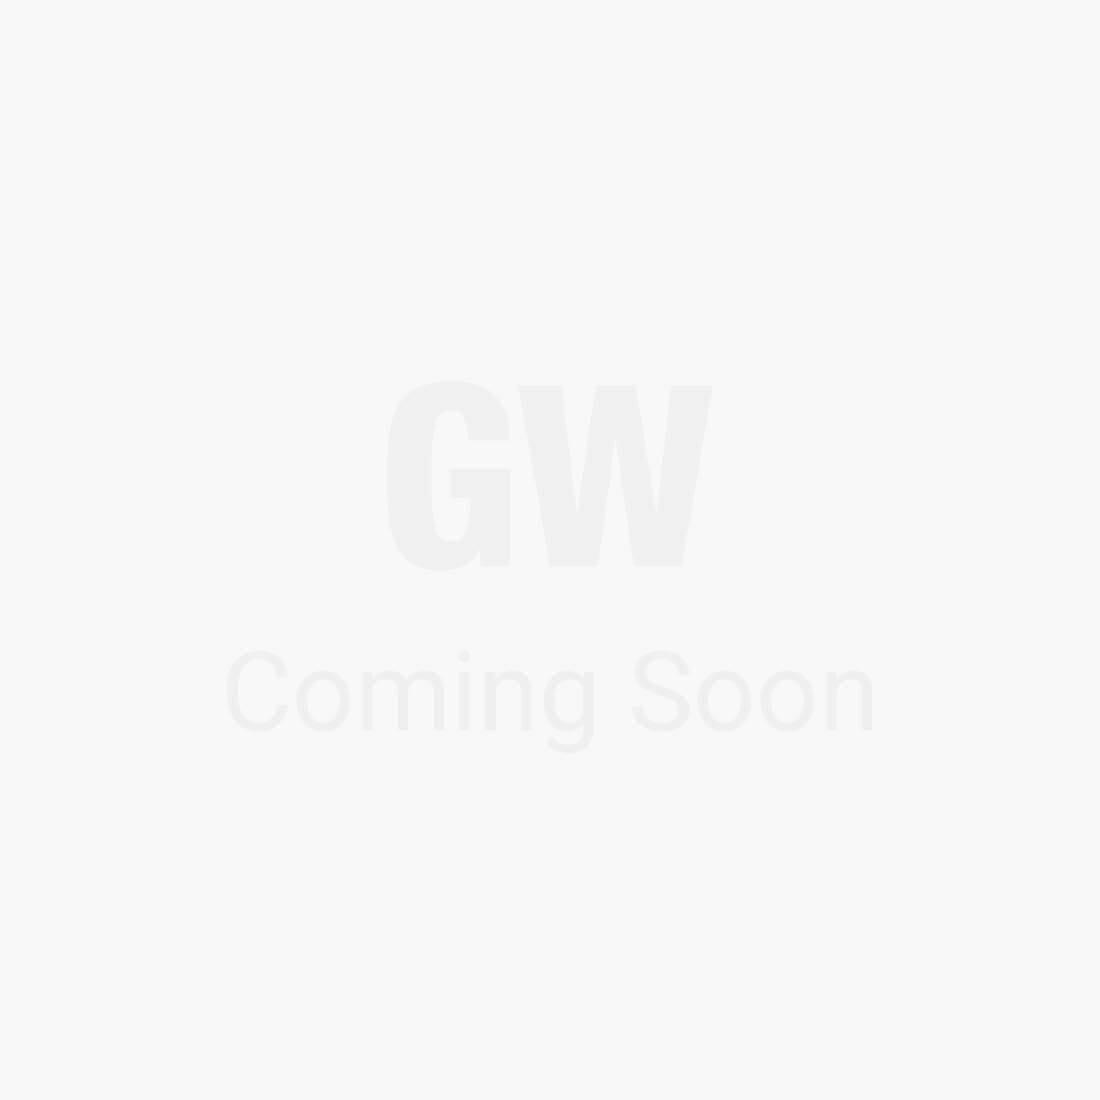 Balthazar Cylinder Vessel